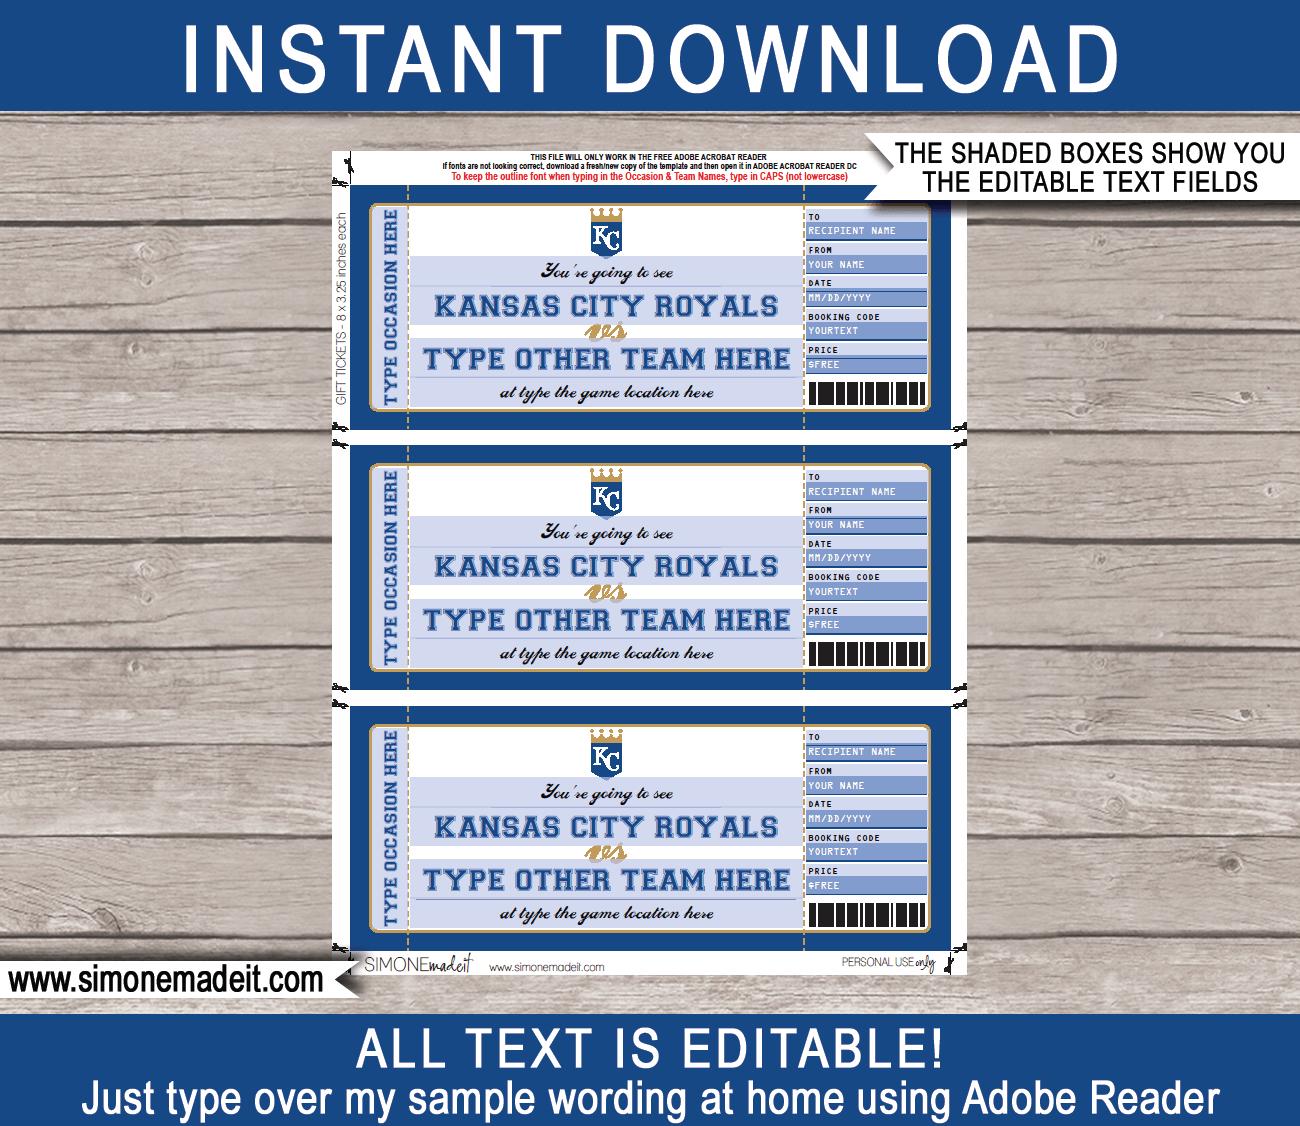 Kansas City Royals Game Ticket Gift Voucher  Printable throughout 5K Race Certificate Template 7 Extraordinary Ideas